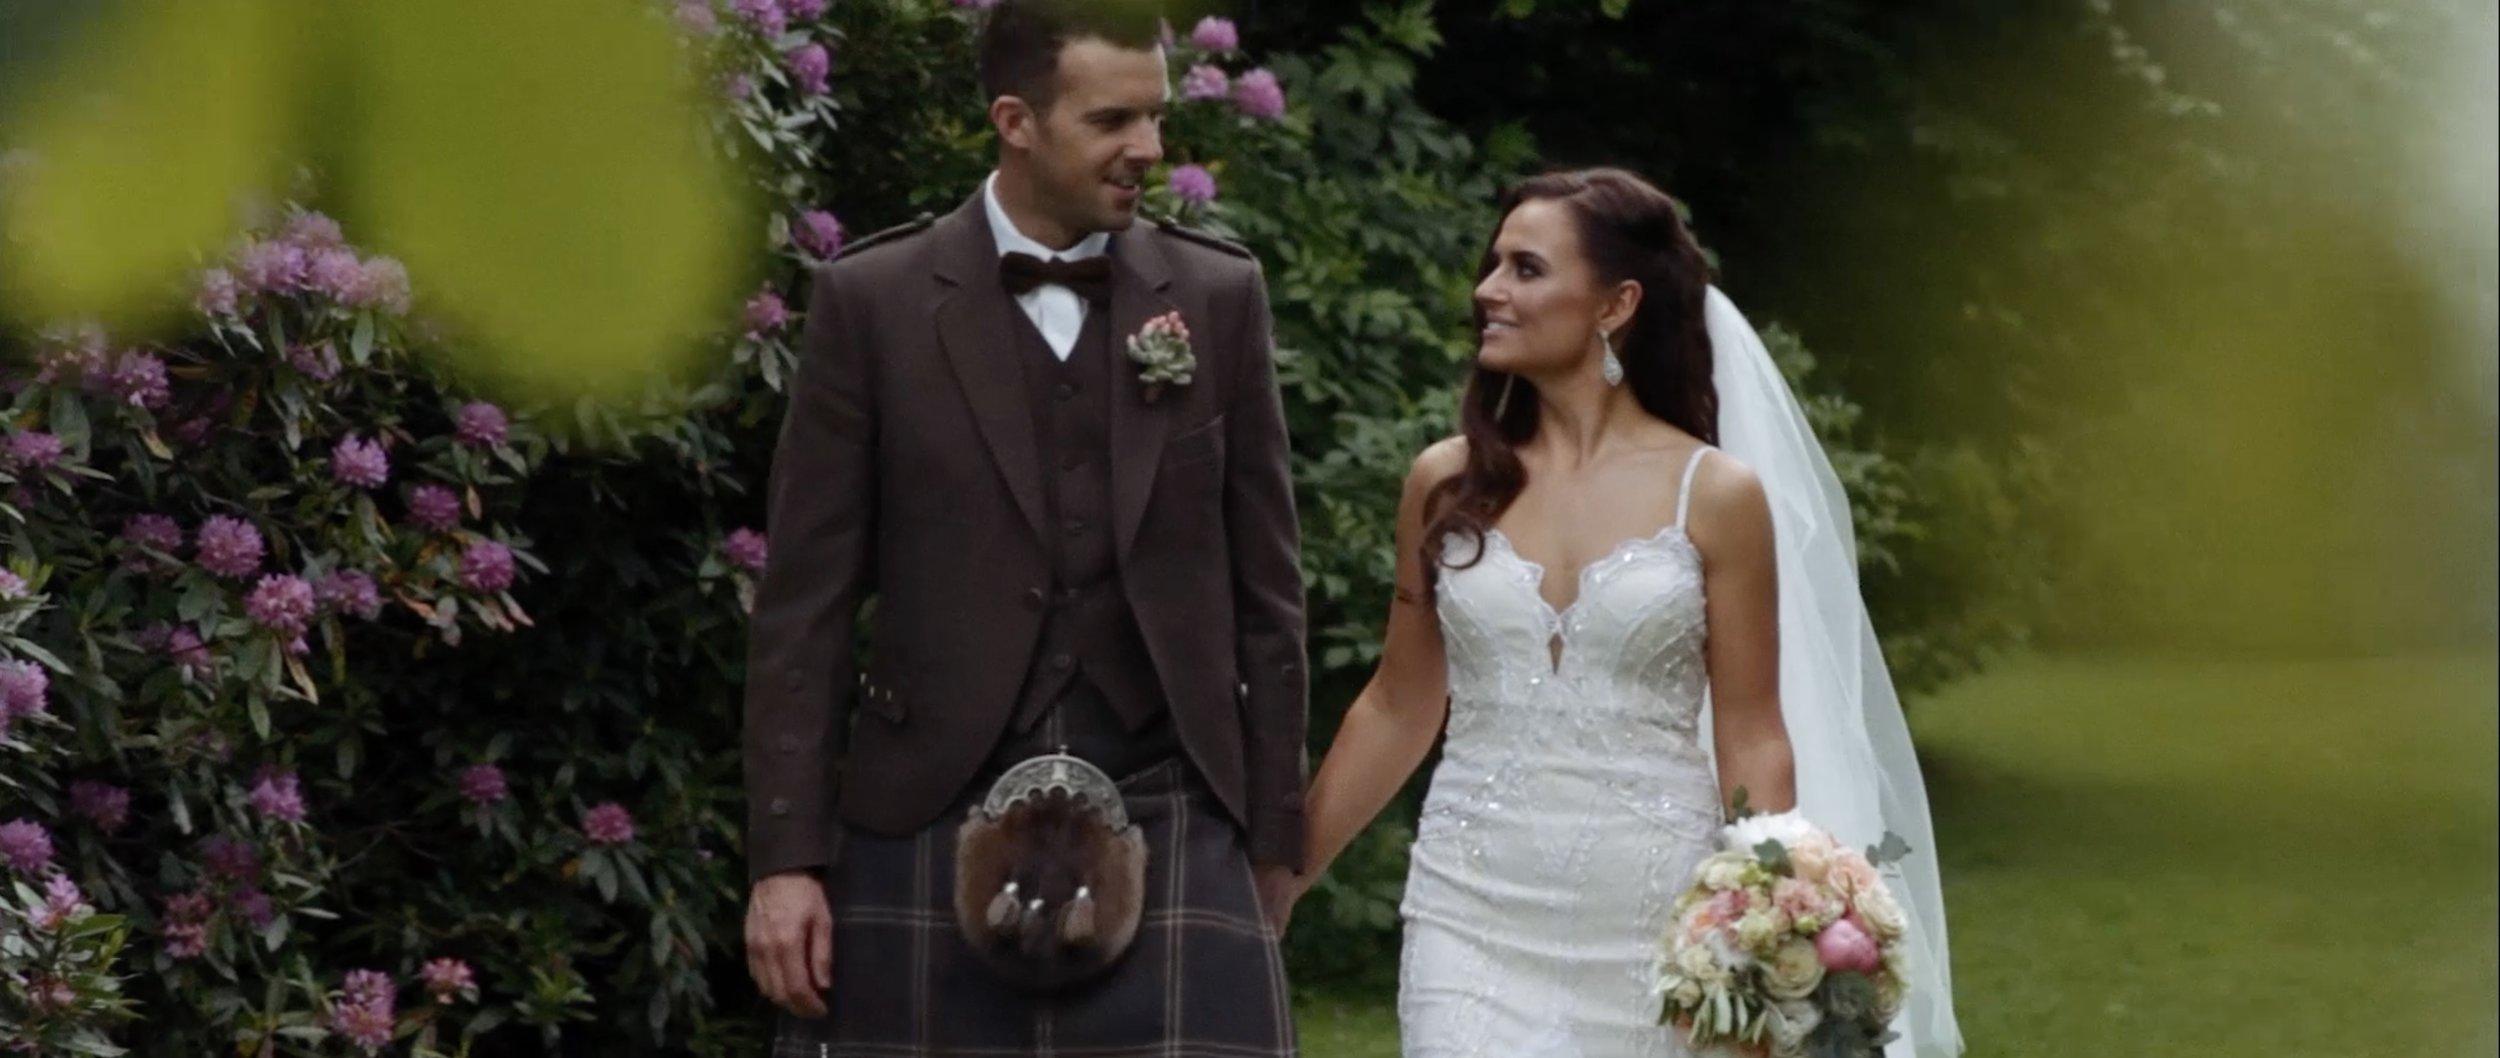 glencoe-wedding-videographer_LL_06.jpg